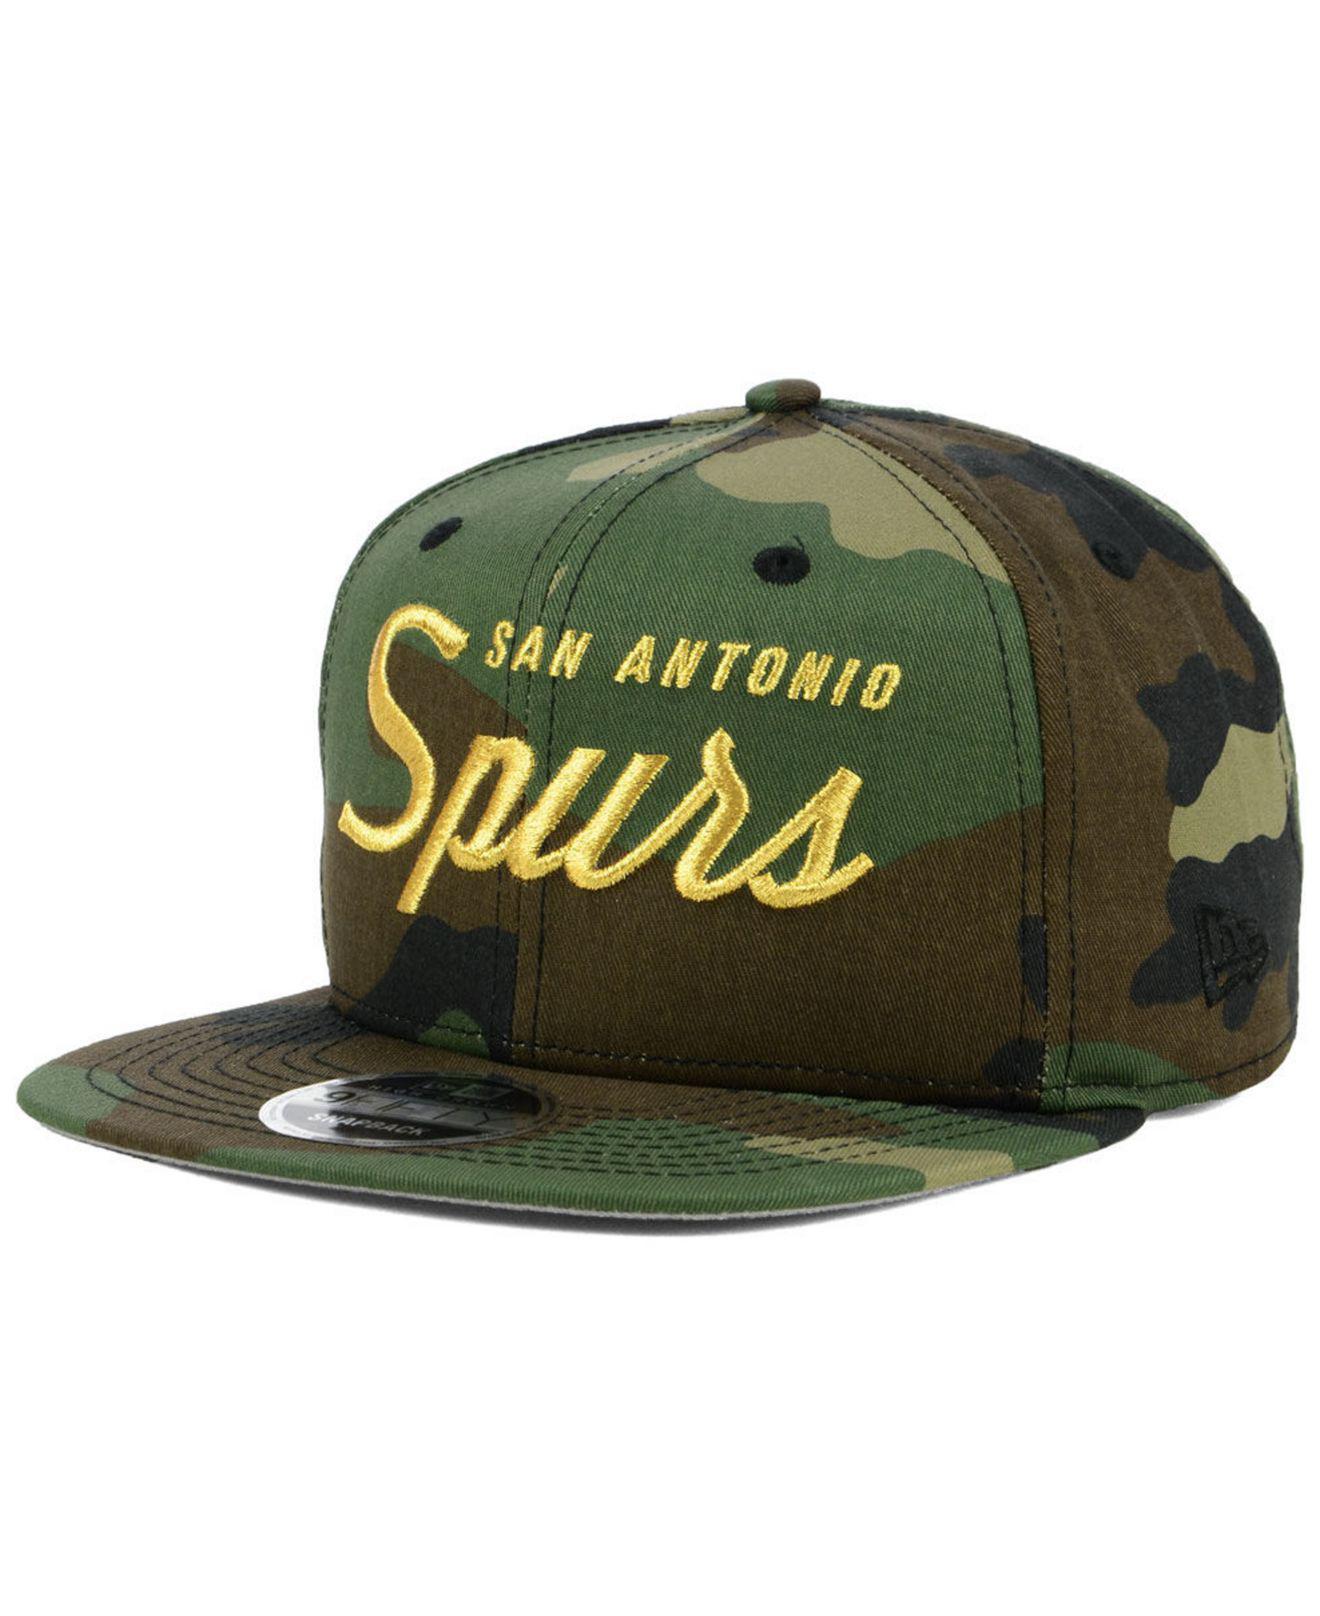 2f31d897577 Lyst - Ktz San Antonio Spurs Classic Script 9fifty Snapback Cap in ...